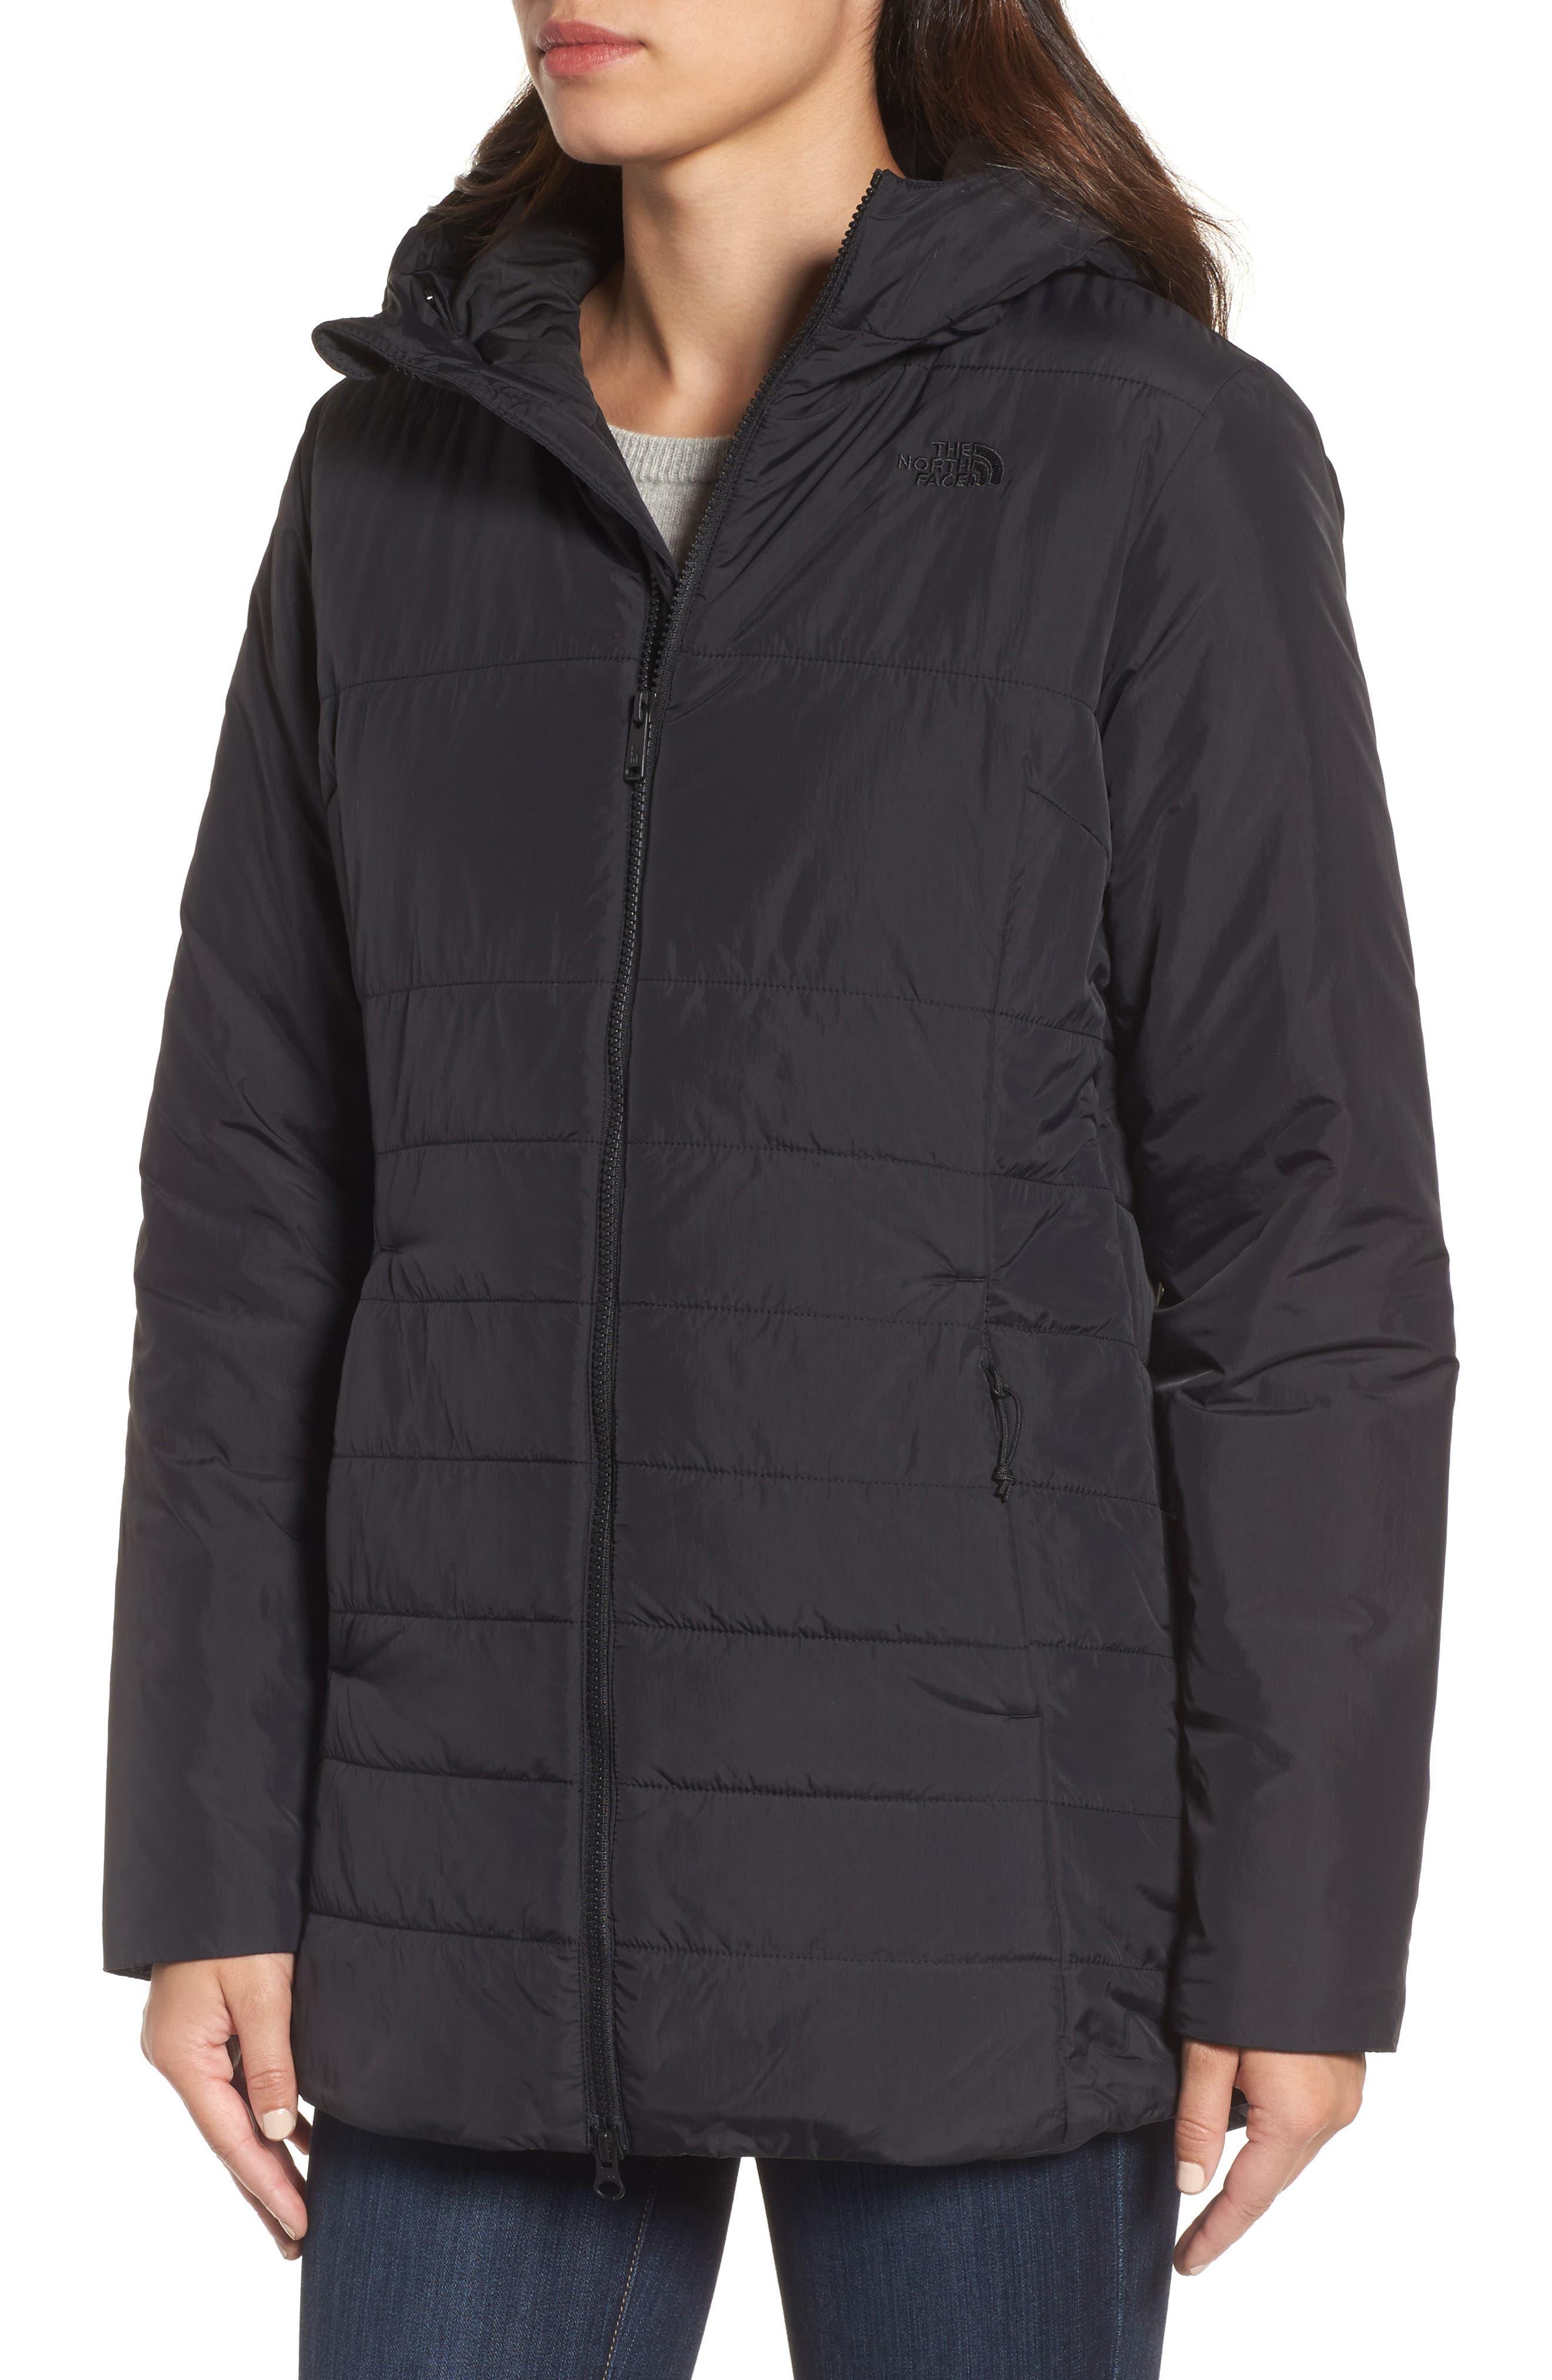 Alternate Image 4  - The North Face Harway Heatseeker™ Water-Resistant Jacket with Faux Fur Trim